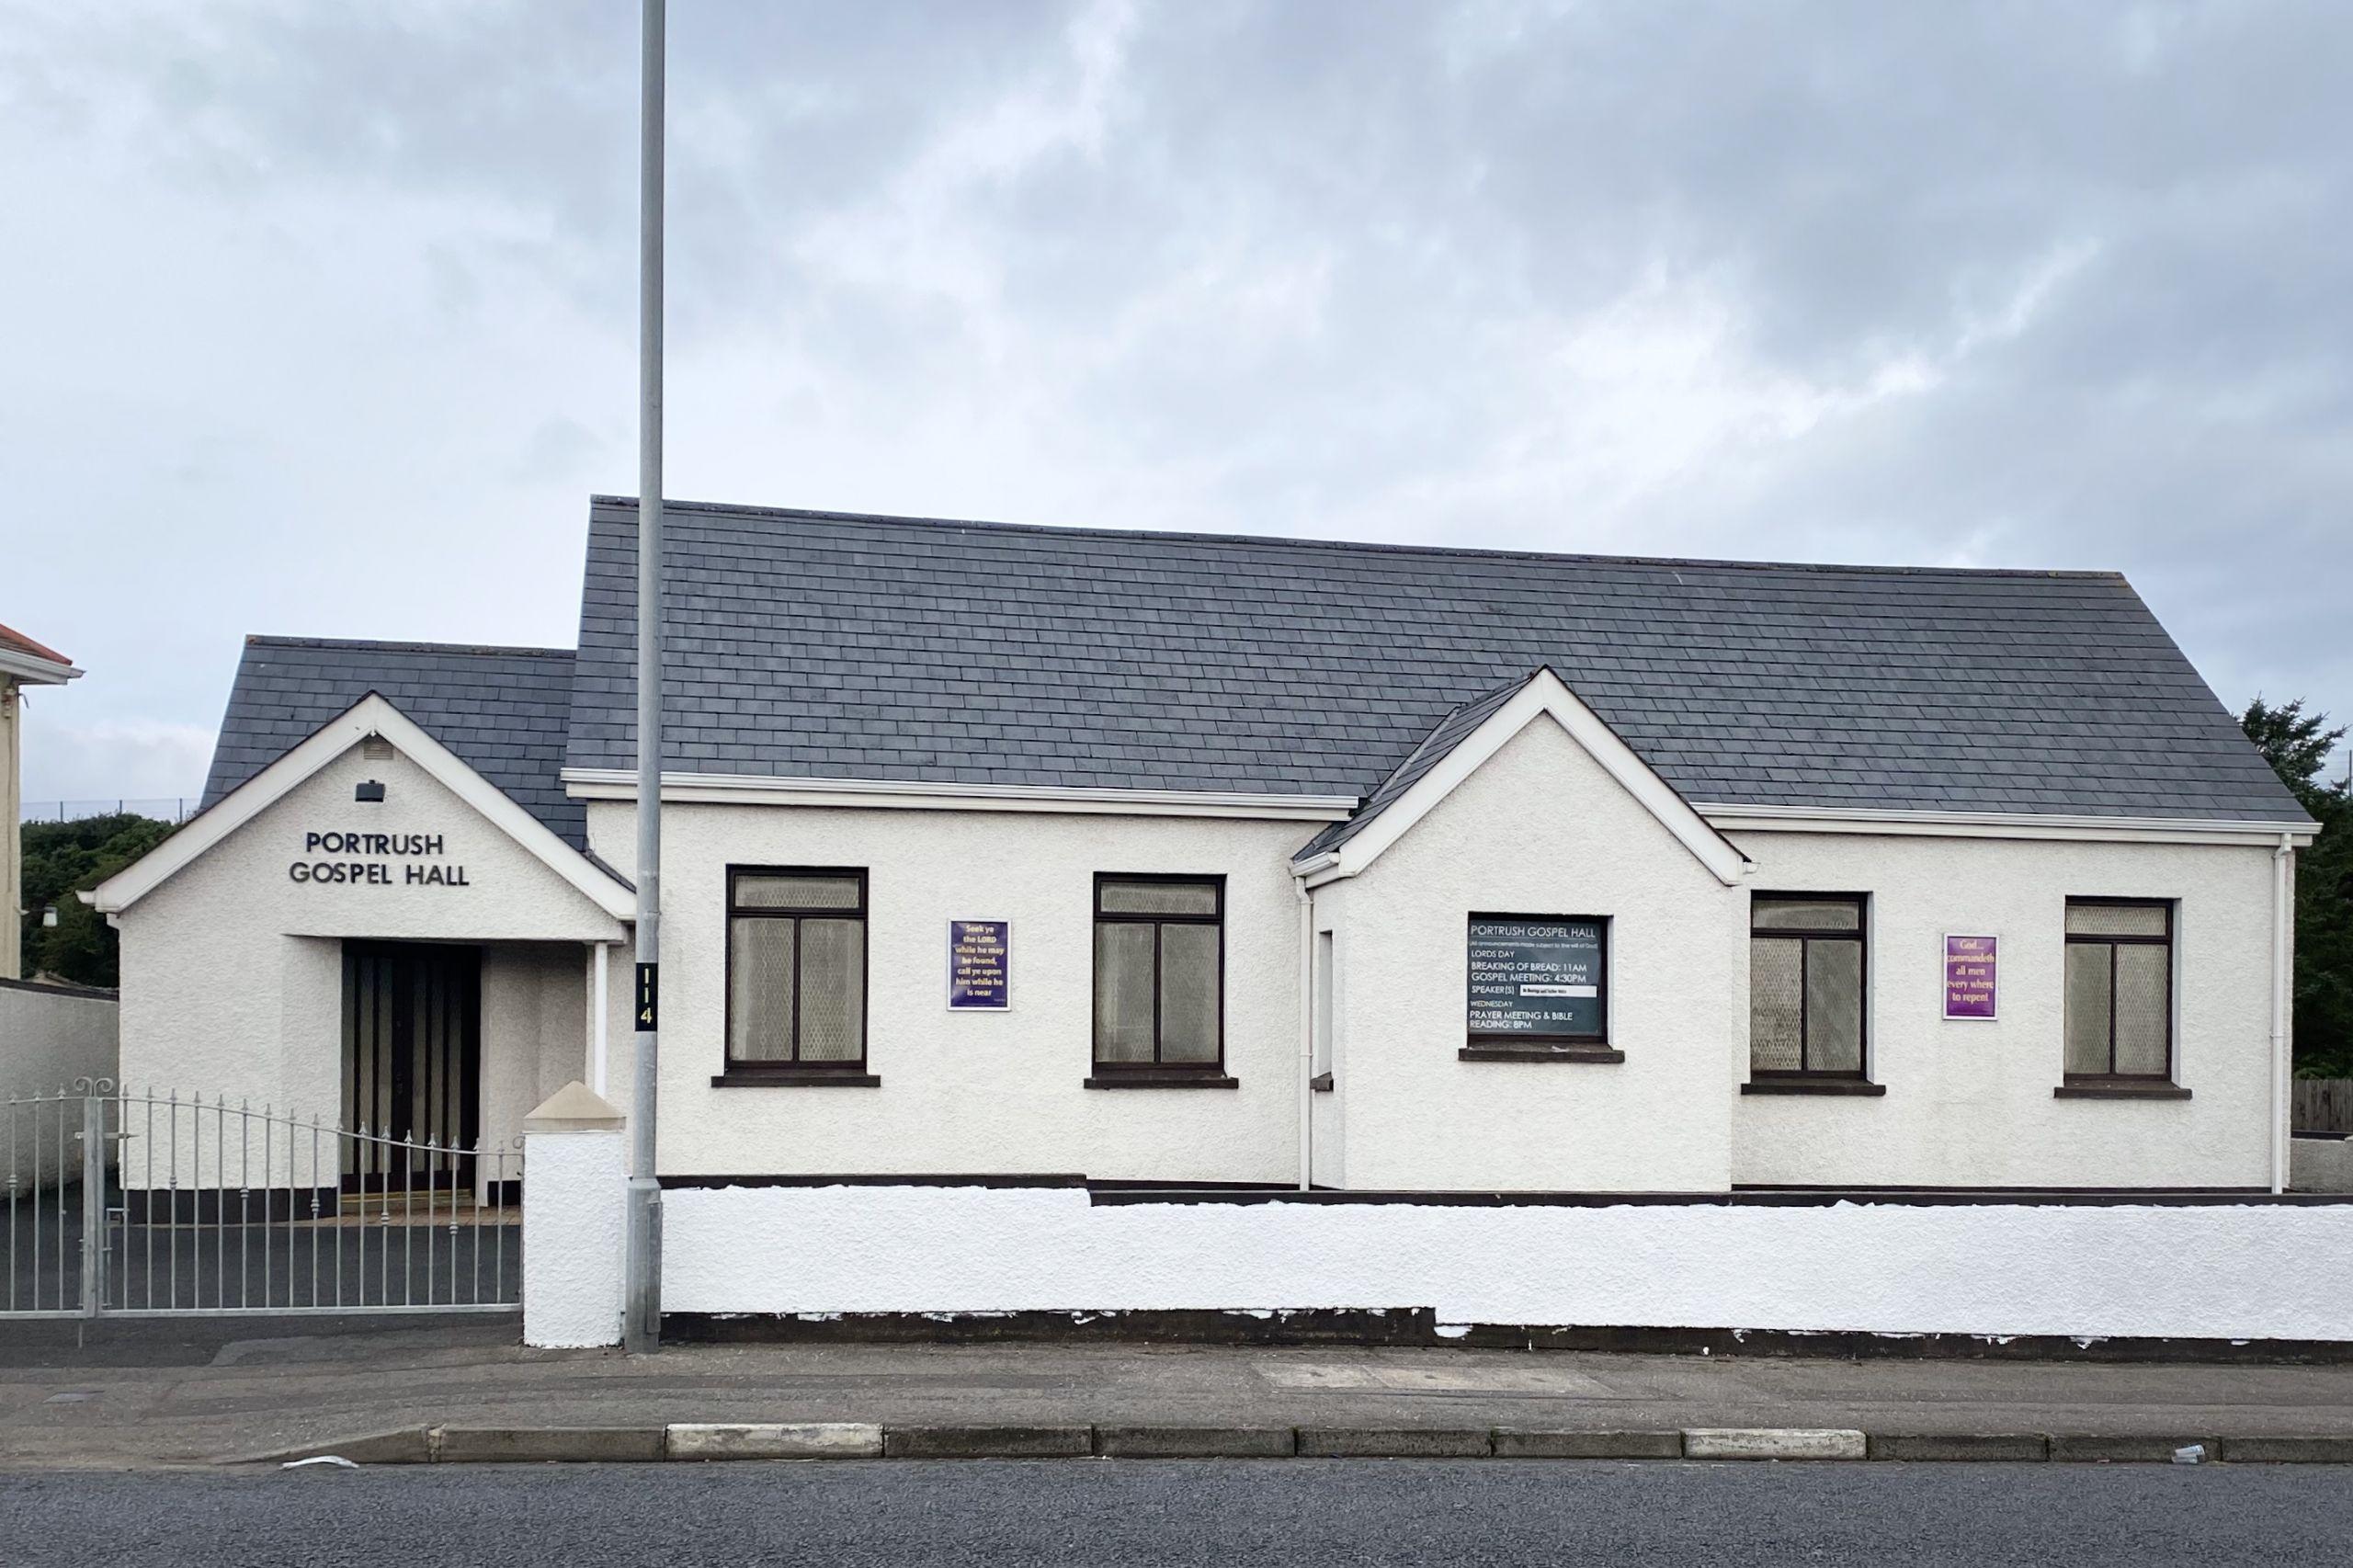 Portrush Gospel Hall